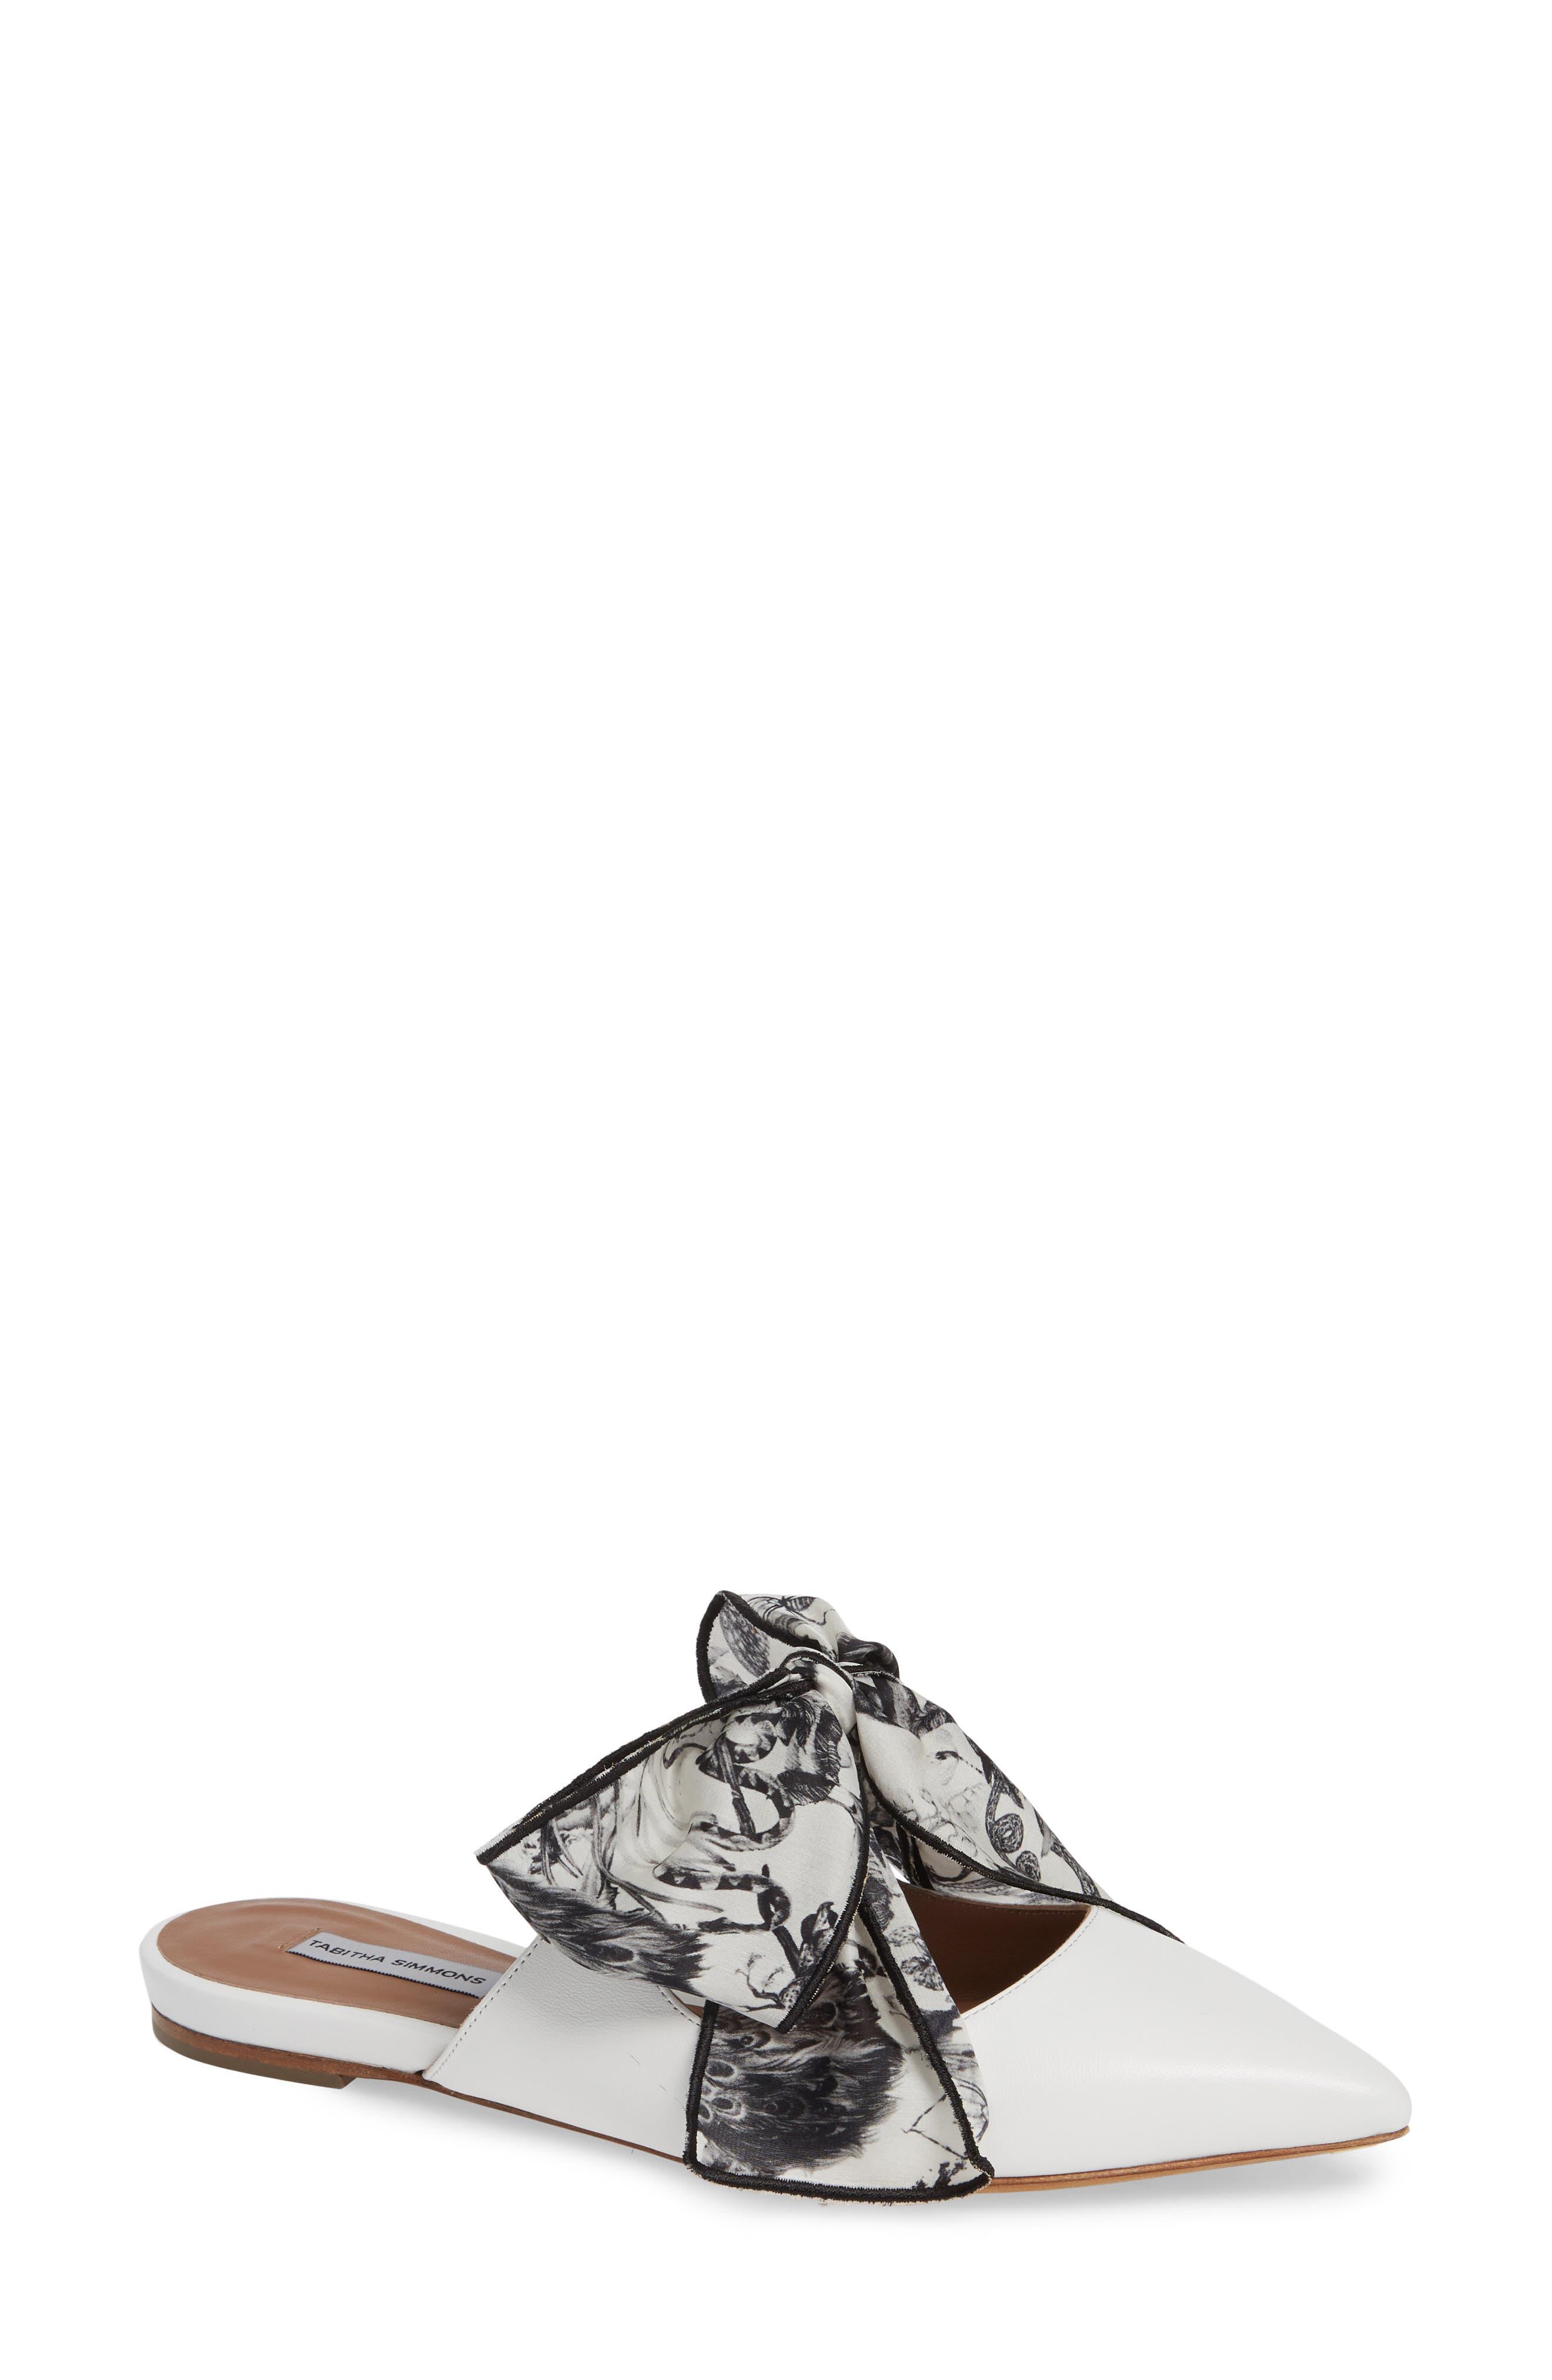 39cb40ab9d9 Women s Tabitha Simmons Designer Shoes